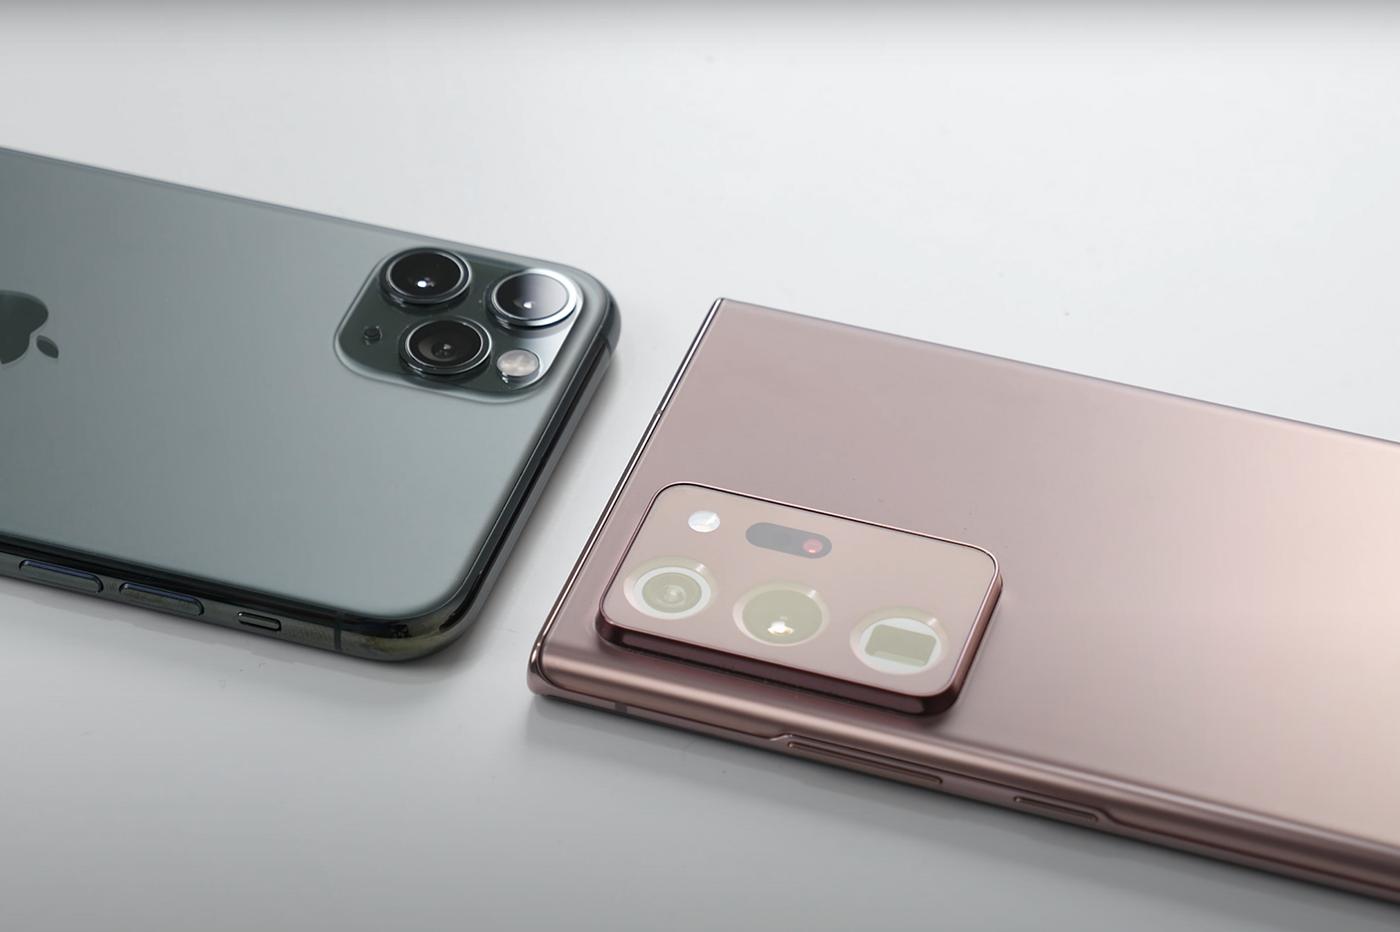 Apple Samsung iPhone 13